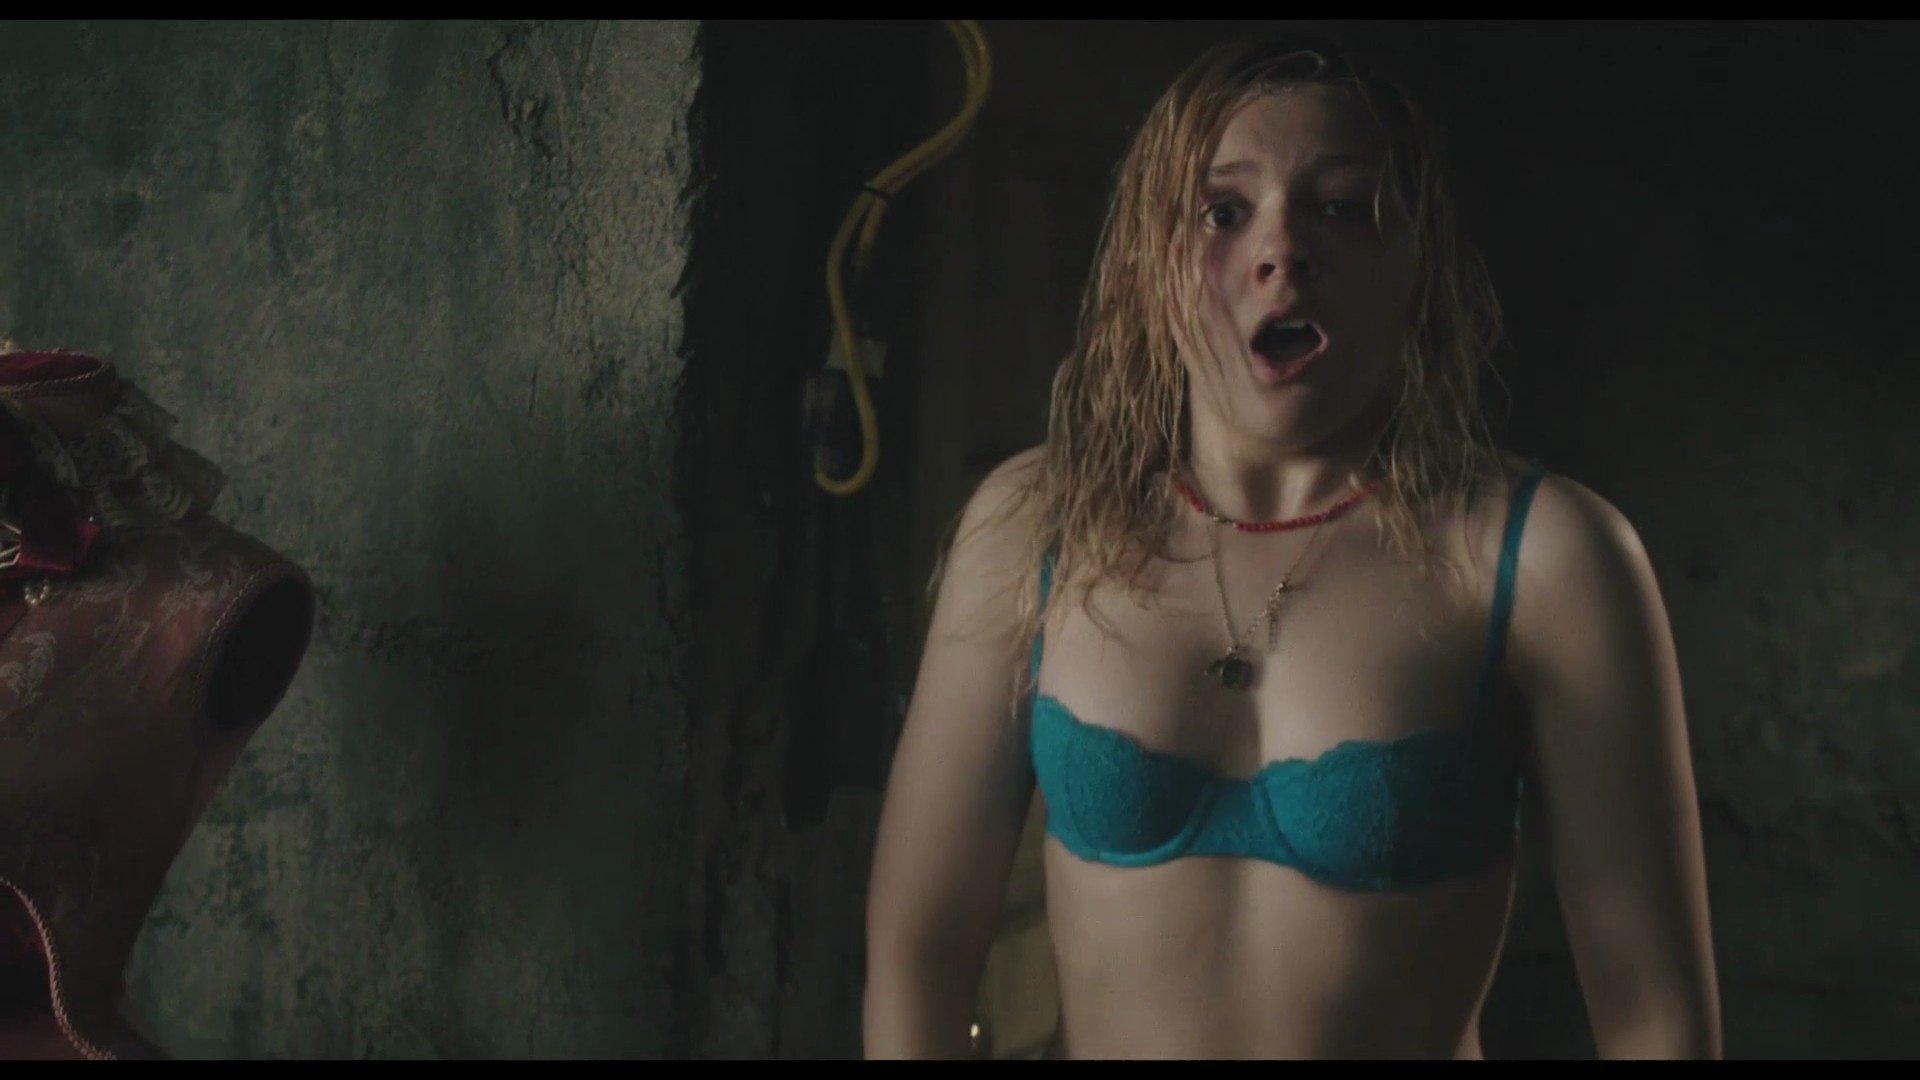 nackt Breslin Abigail Nude celebrity